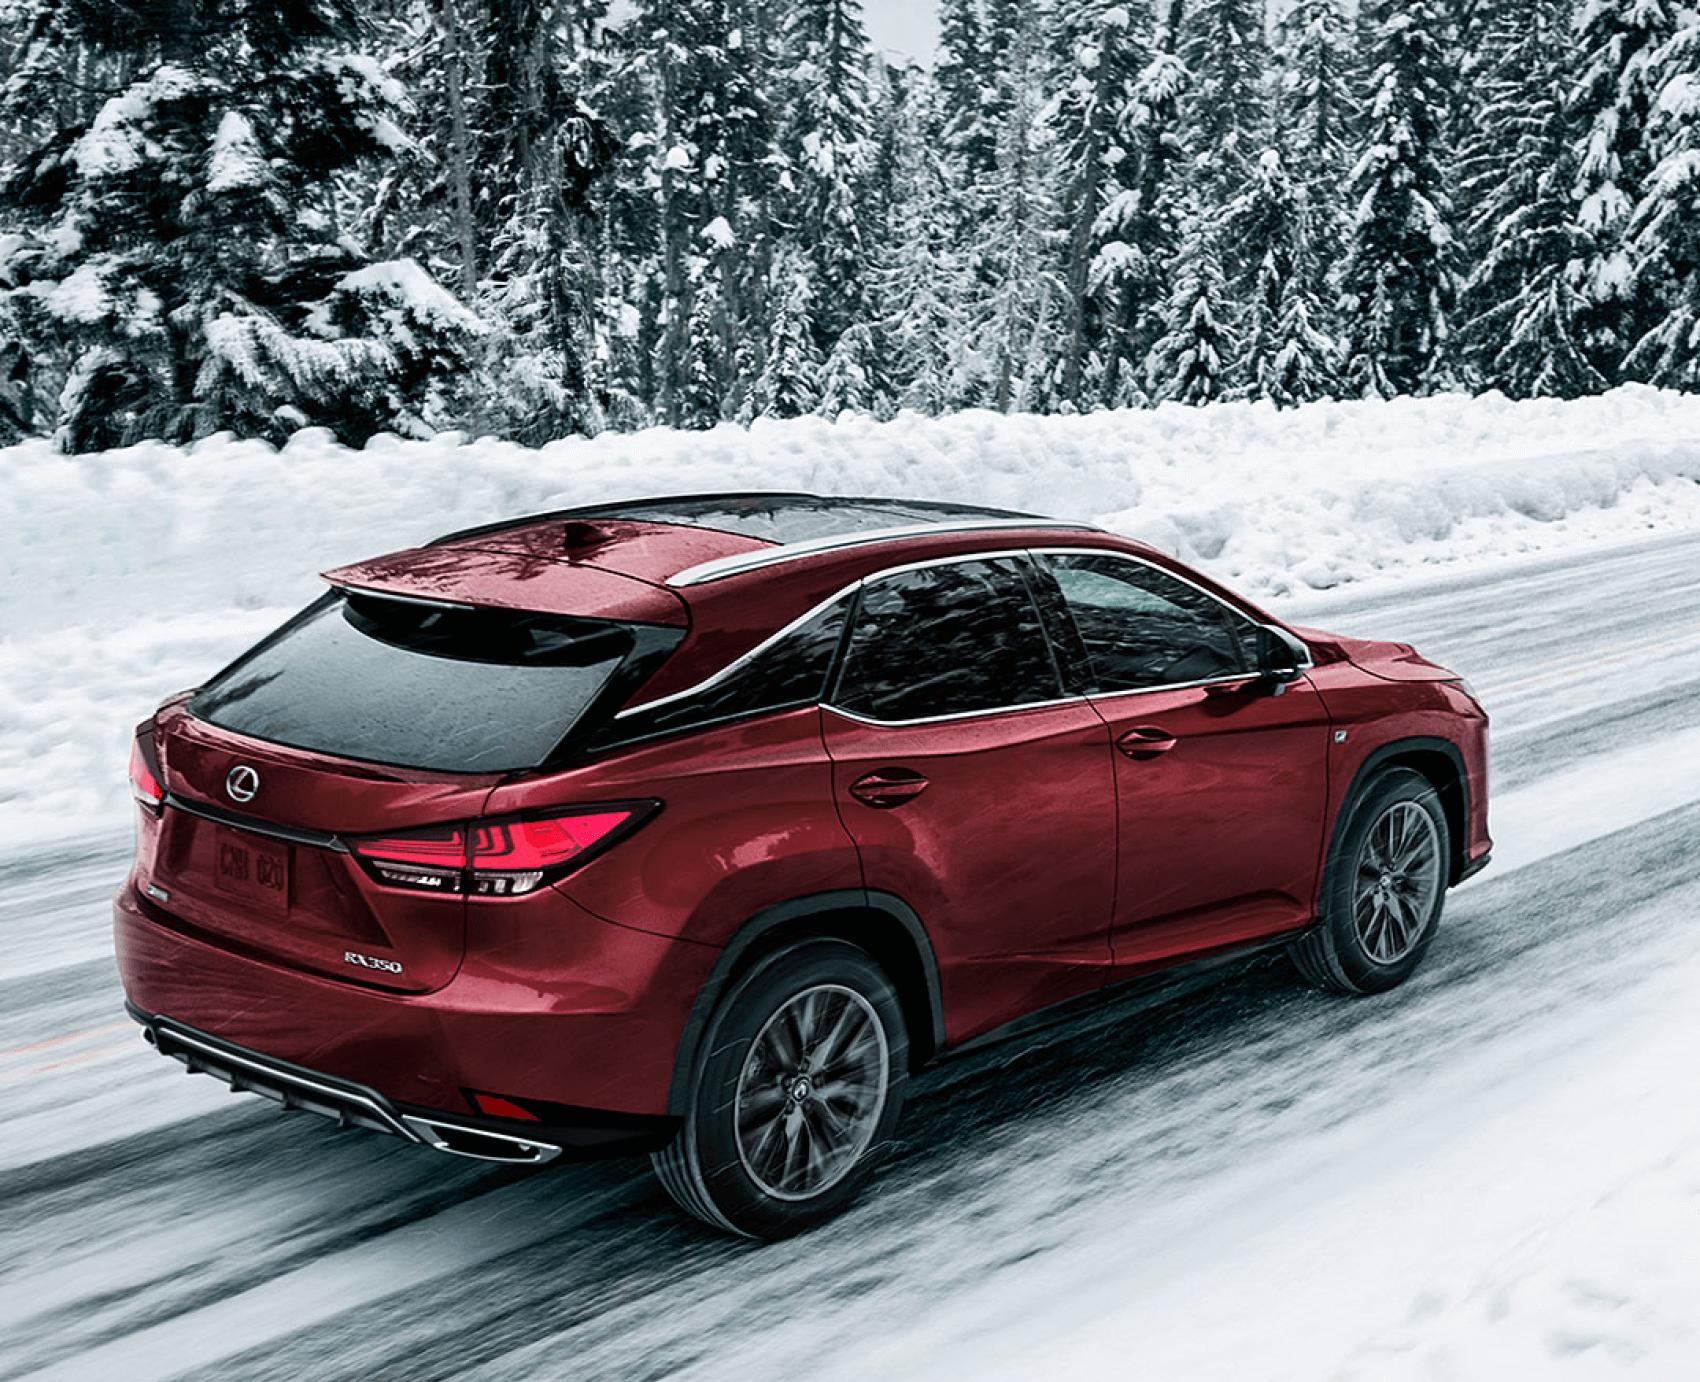 2021 Lexus RX Red Winter Snow Lexus of Larchmont